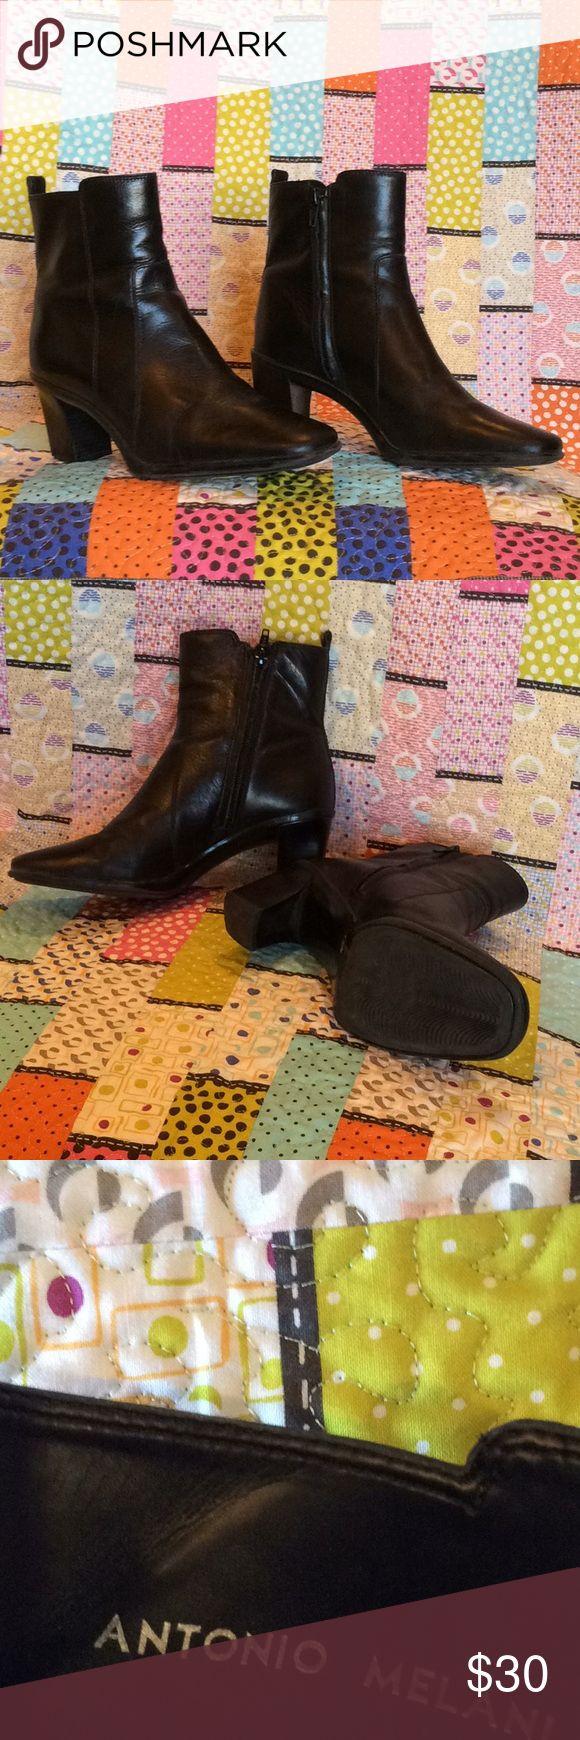 Ladies Black Antonio Melani Boots Black Leather Booties Little bit of wear on heel otherwise in great shape ANTONIO MELANI Shoes Ankle Boots & Booties